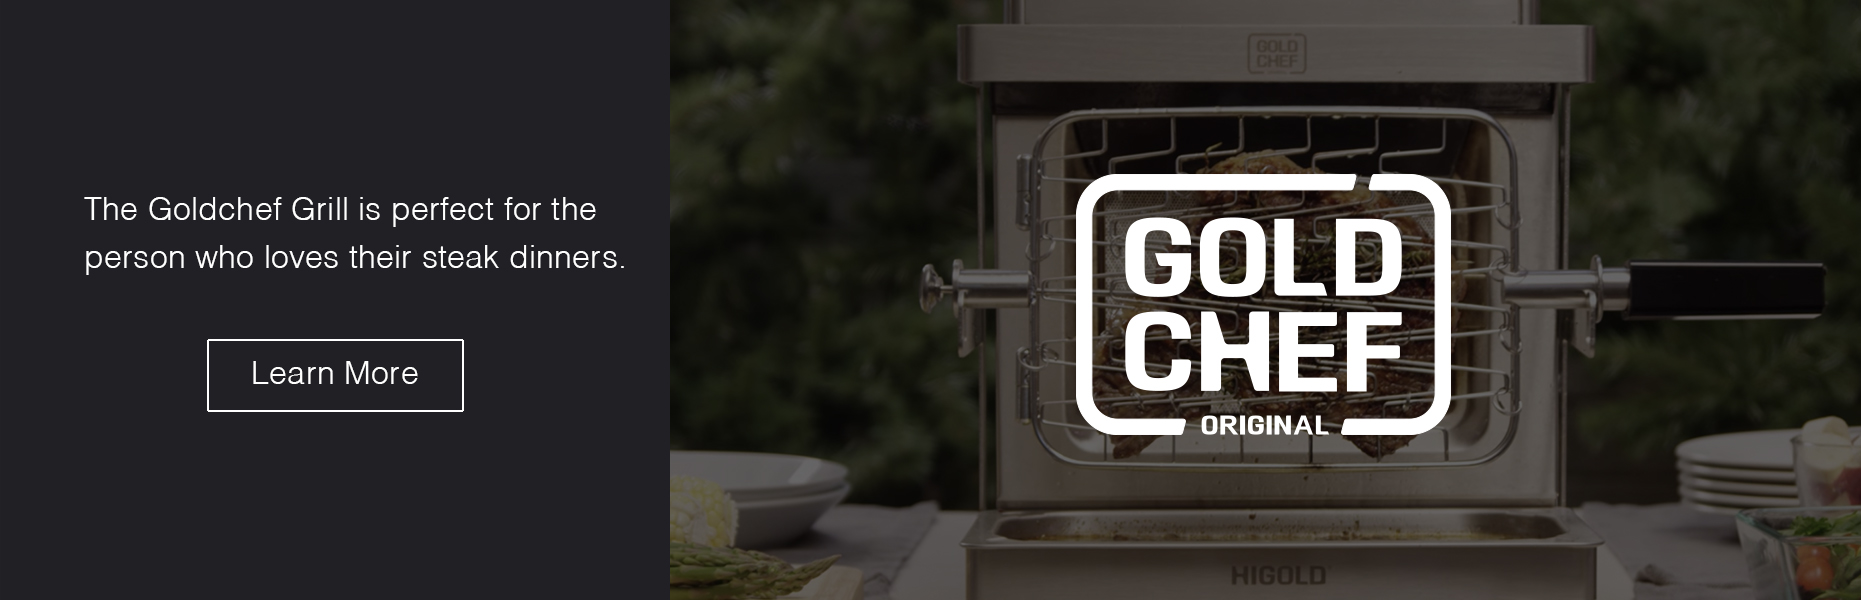 goldchef_banner_new.jpg